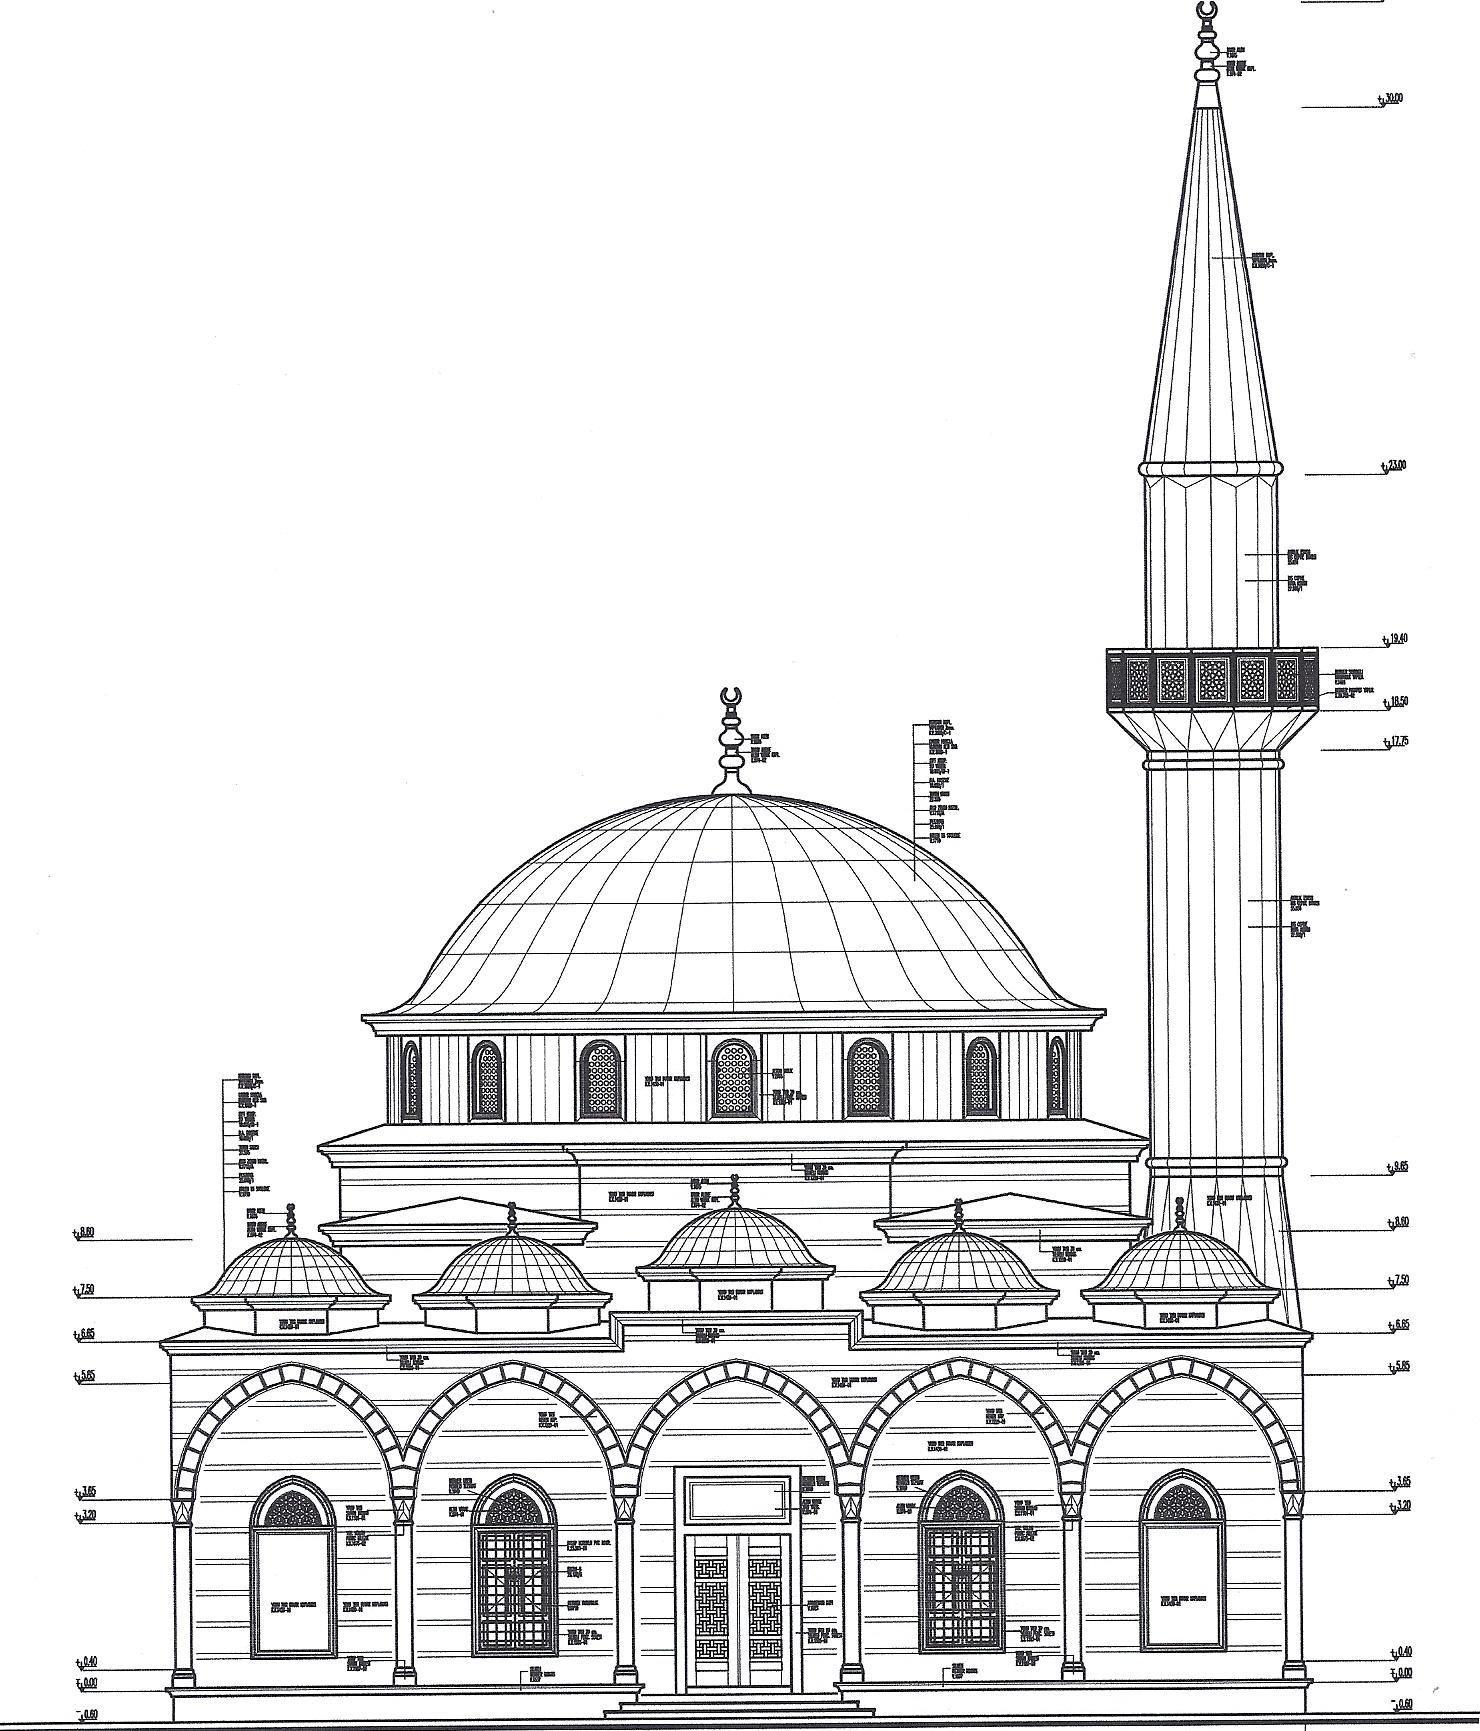 Cami Cizimi 7a193e Jpg 1480 1731 Mimari Cizimler Mimari Cizim Taslaklari Camiler